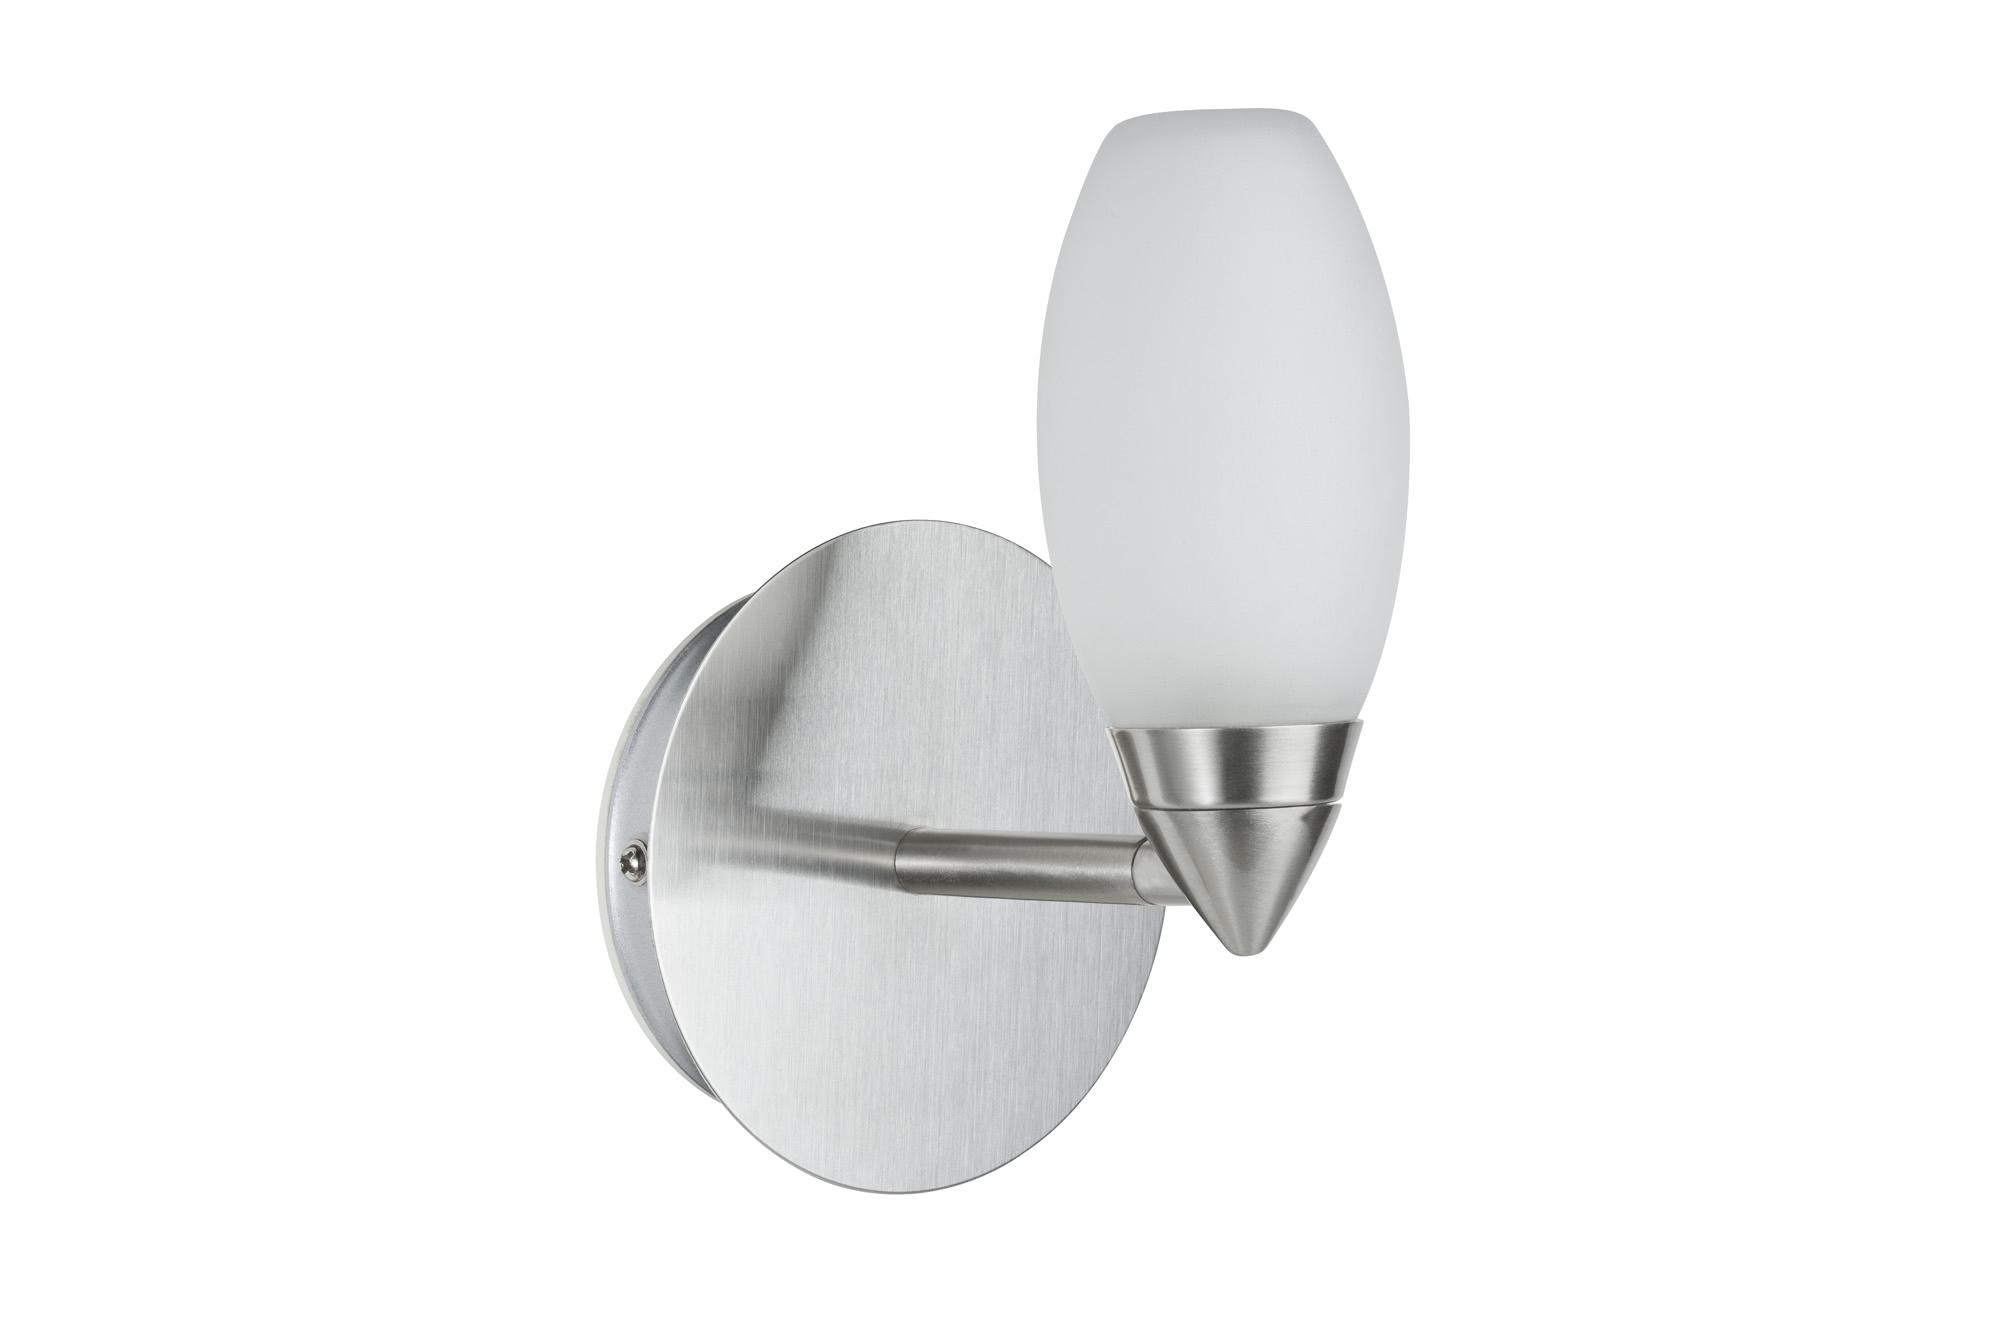 Paulmann. 70352 Светильник настенный галоген 1х33W W-D Carina 230V G9 Железо шероховатое/Сатин